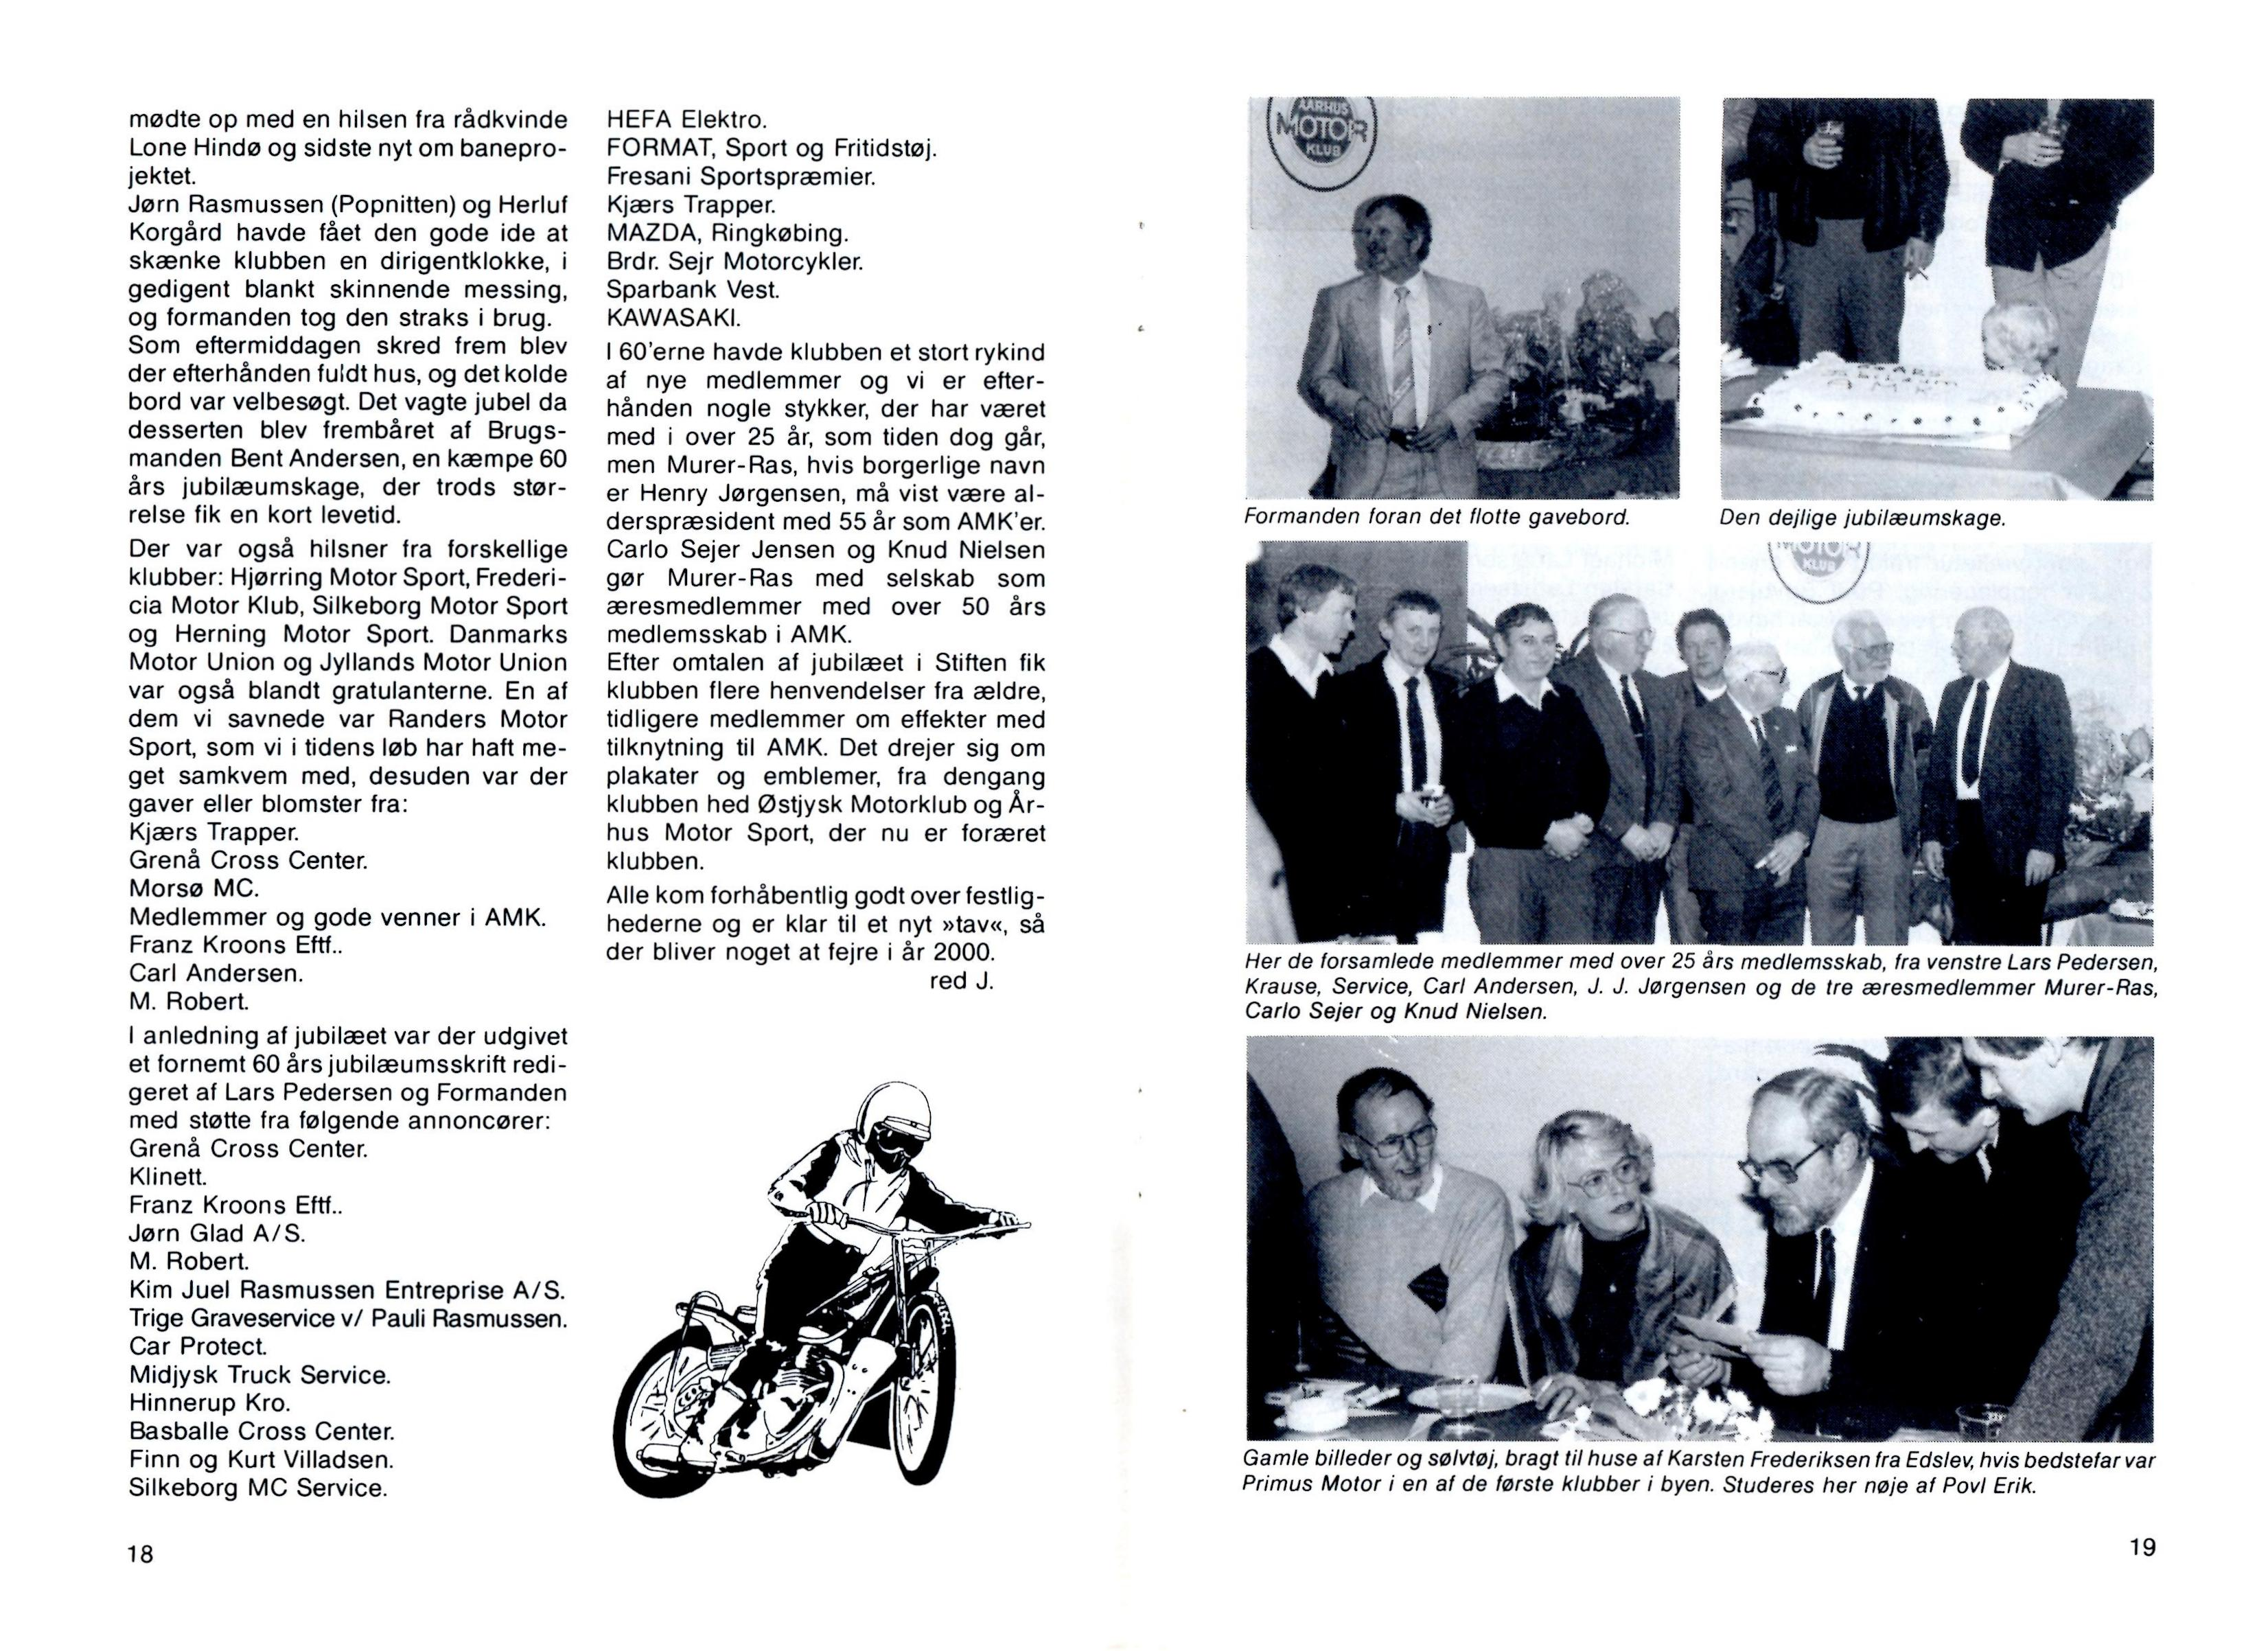 Omtale 2 marts 1990